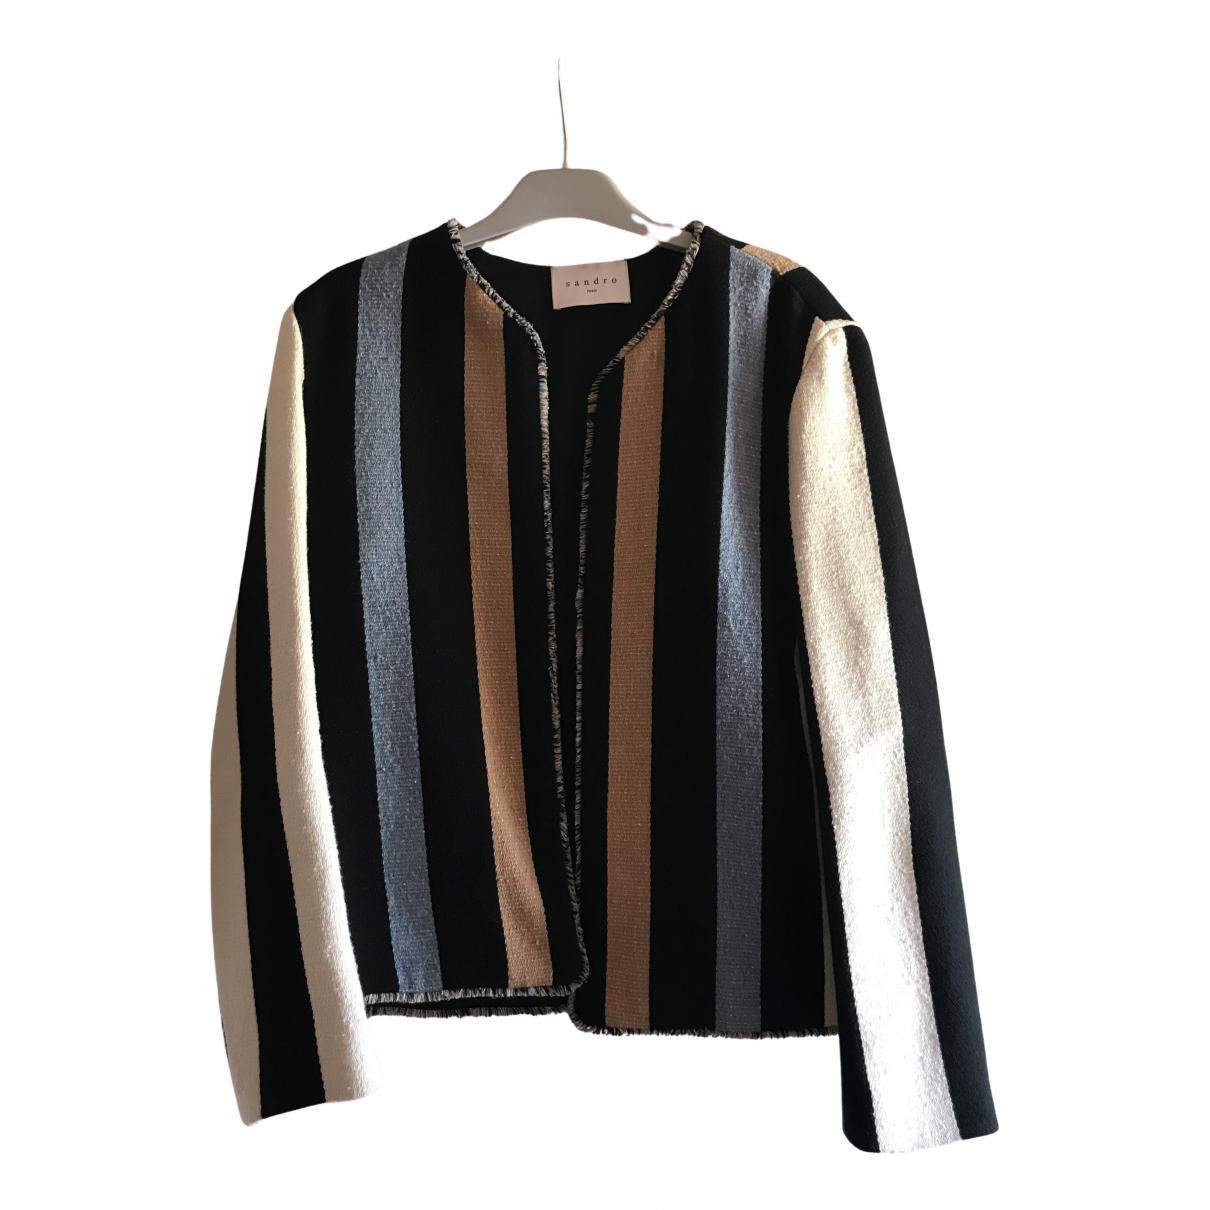 Sandro N Multicolour Cotton jacket for Women 40 FR